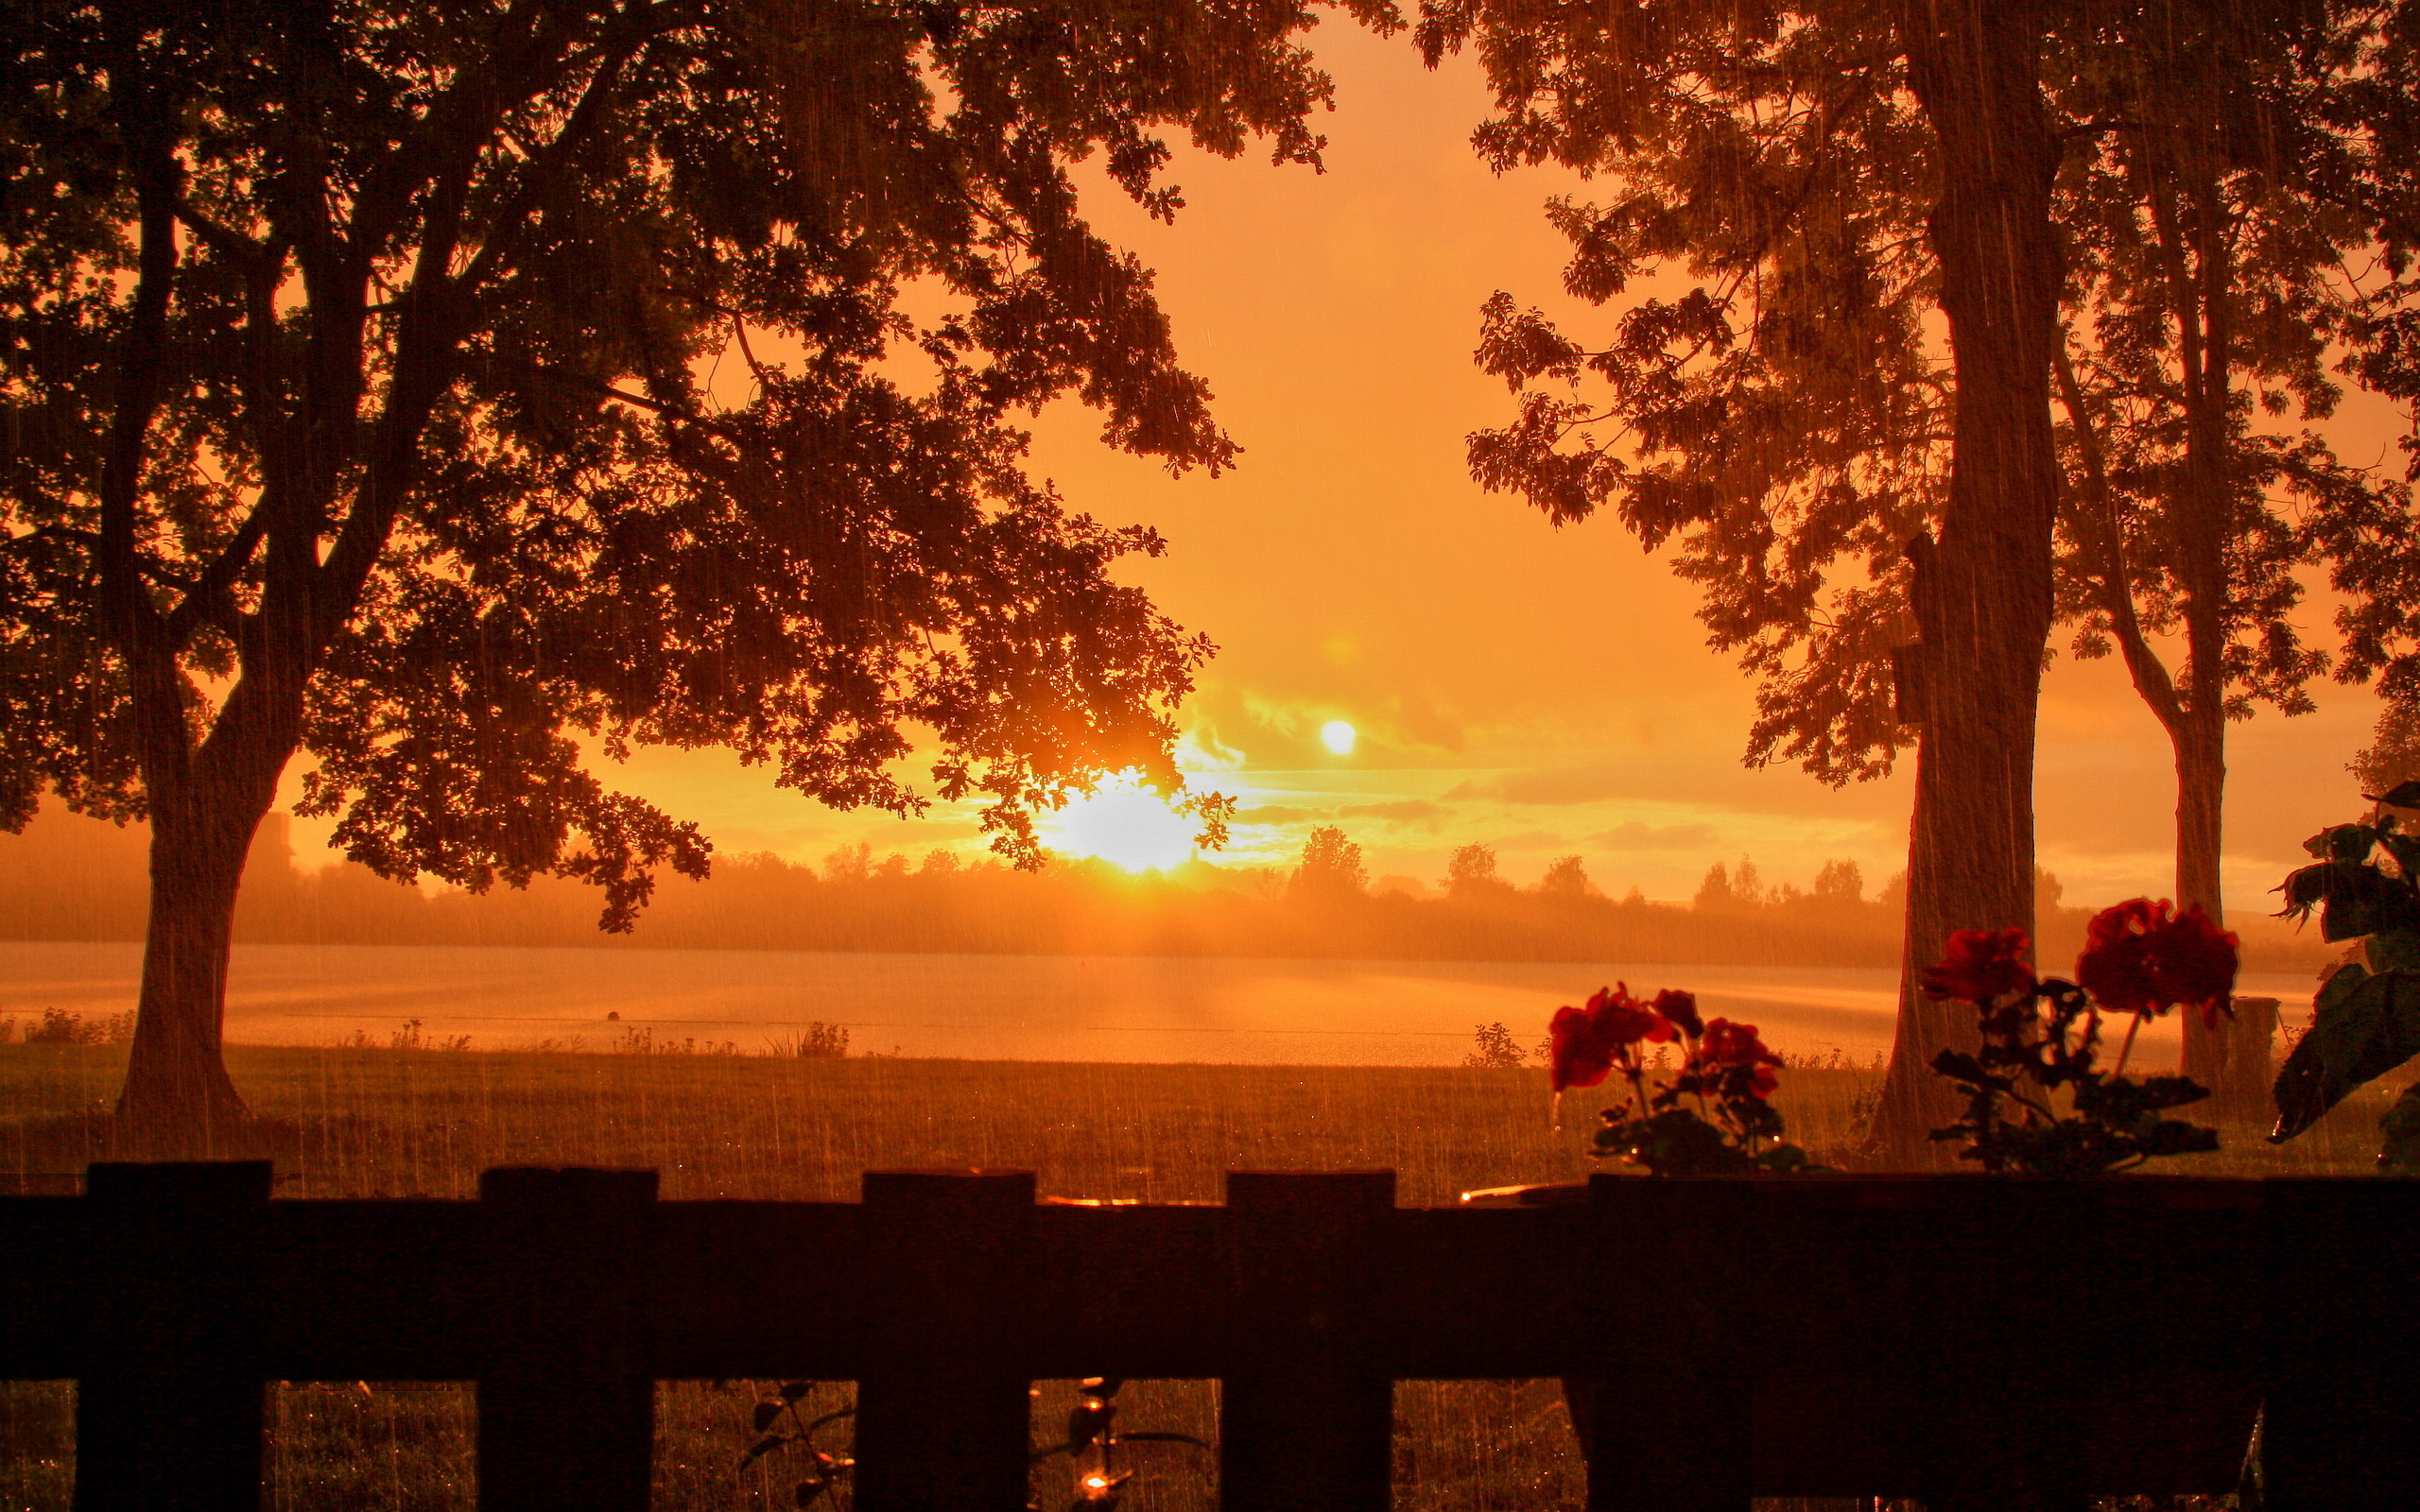 sunset images rain